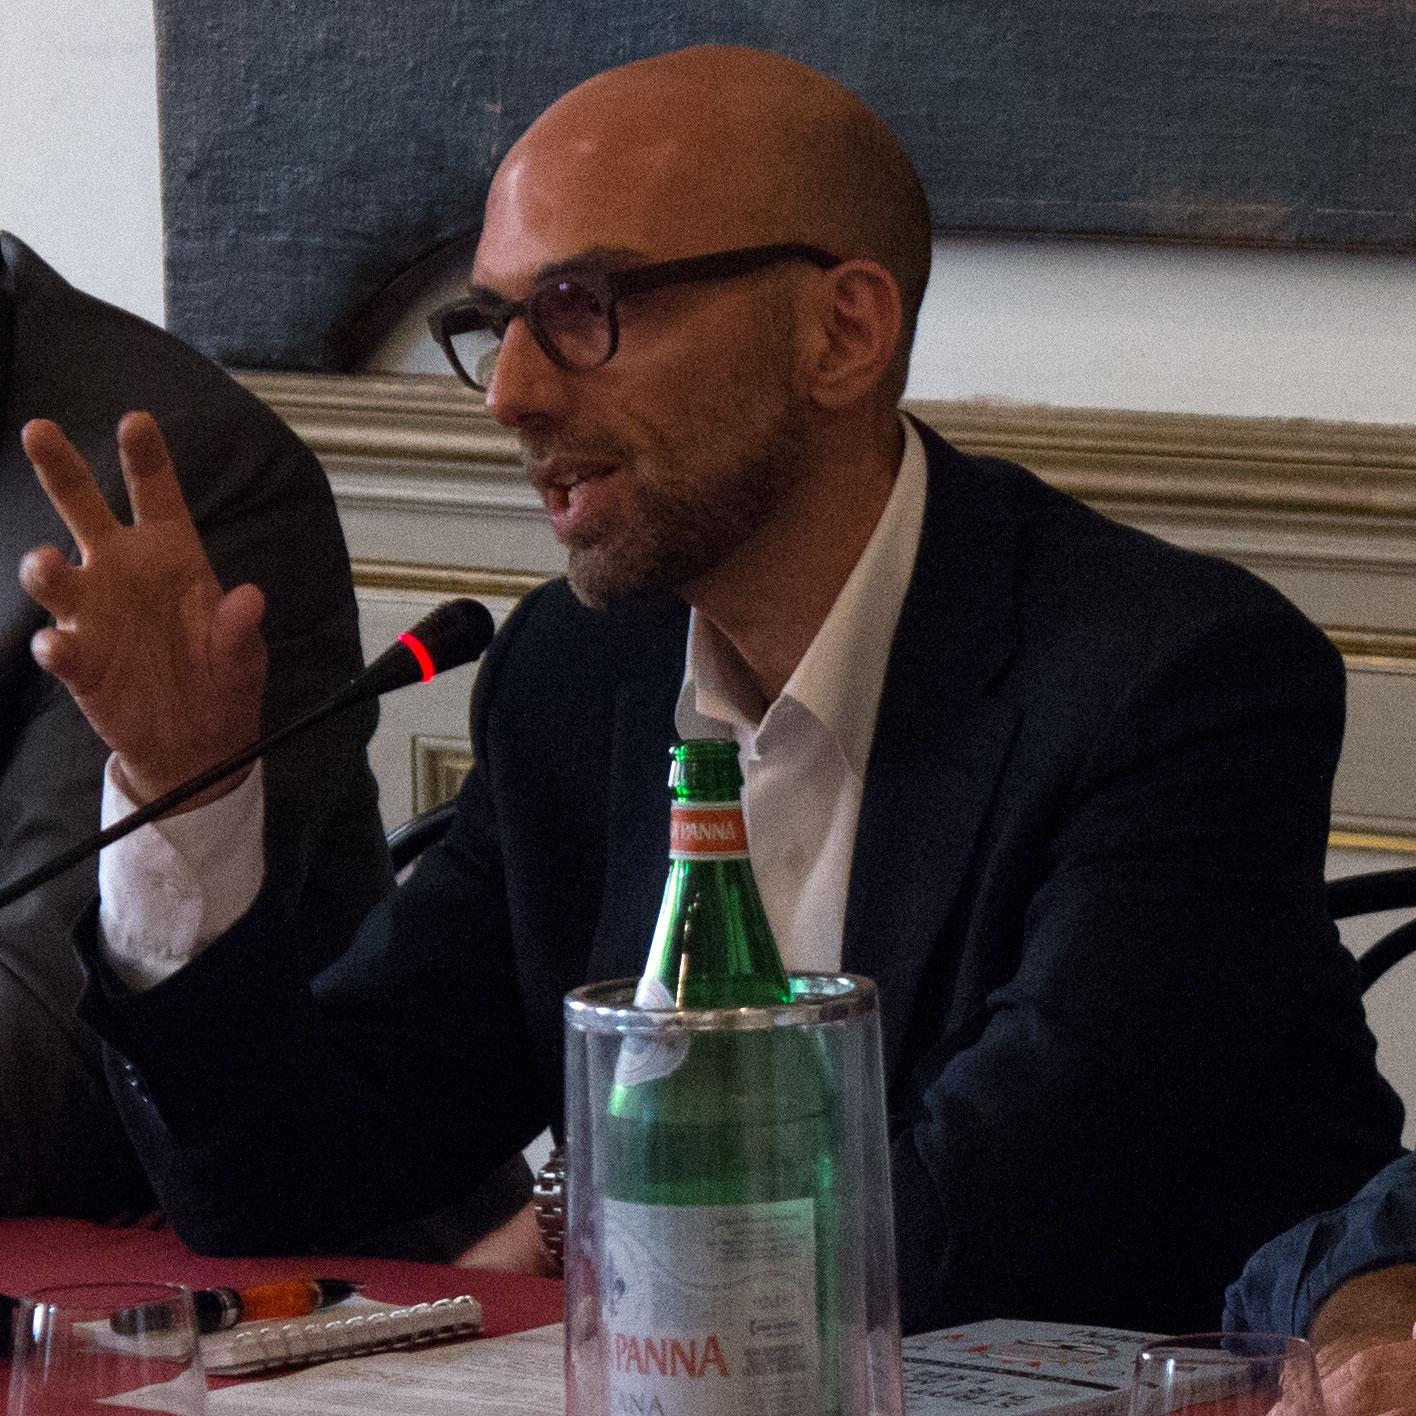 Dario Vascellaro